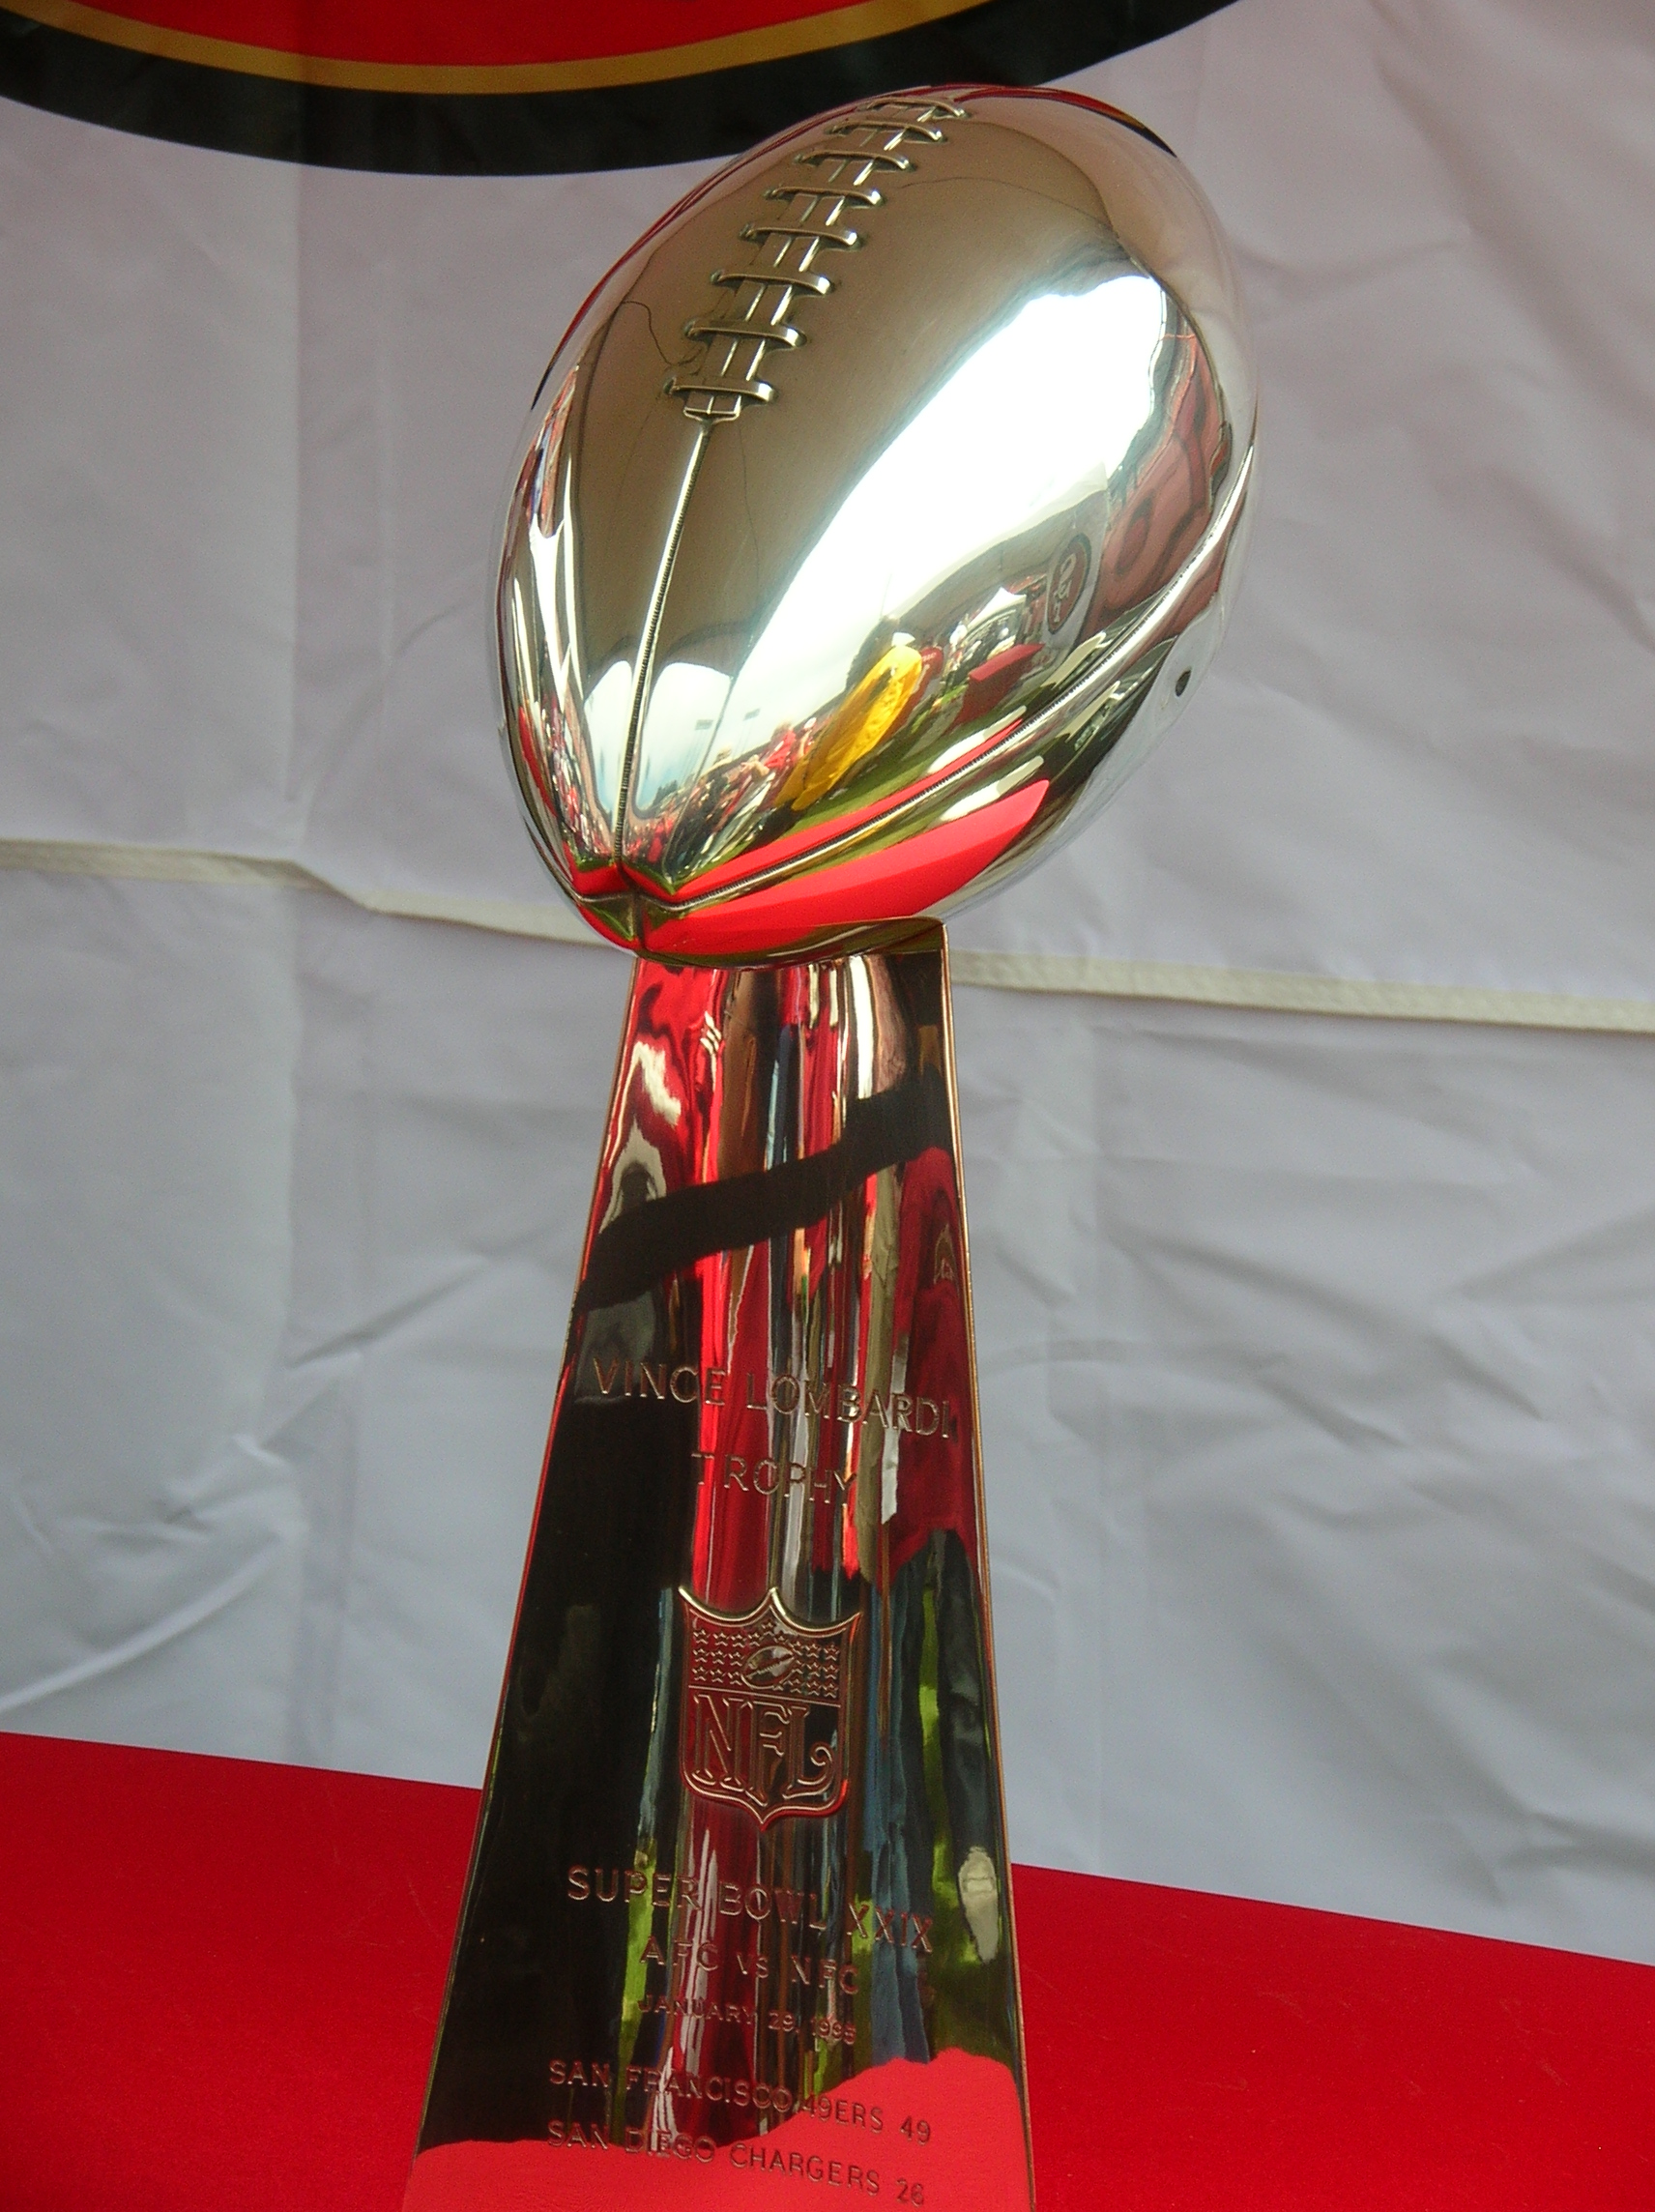 The Super Bowl Vince Lombardi Trophy - Click for larger image